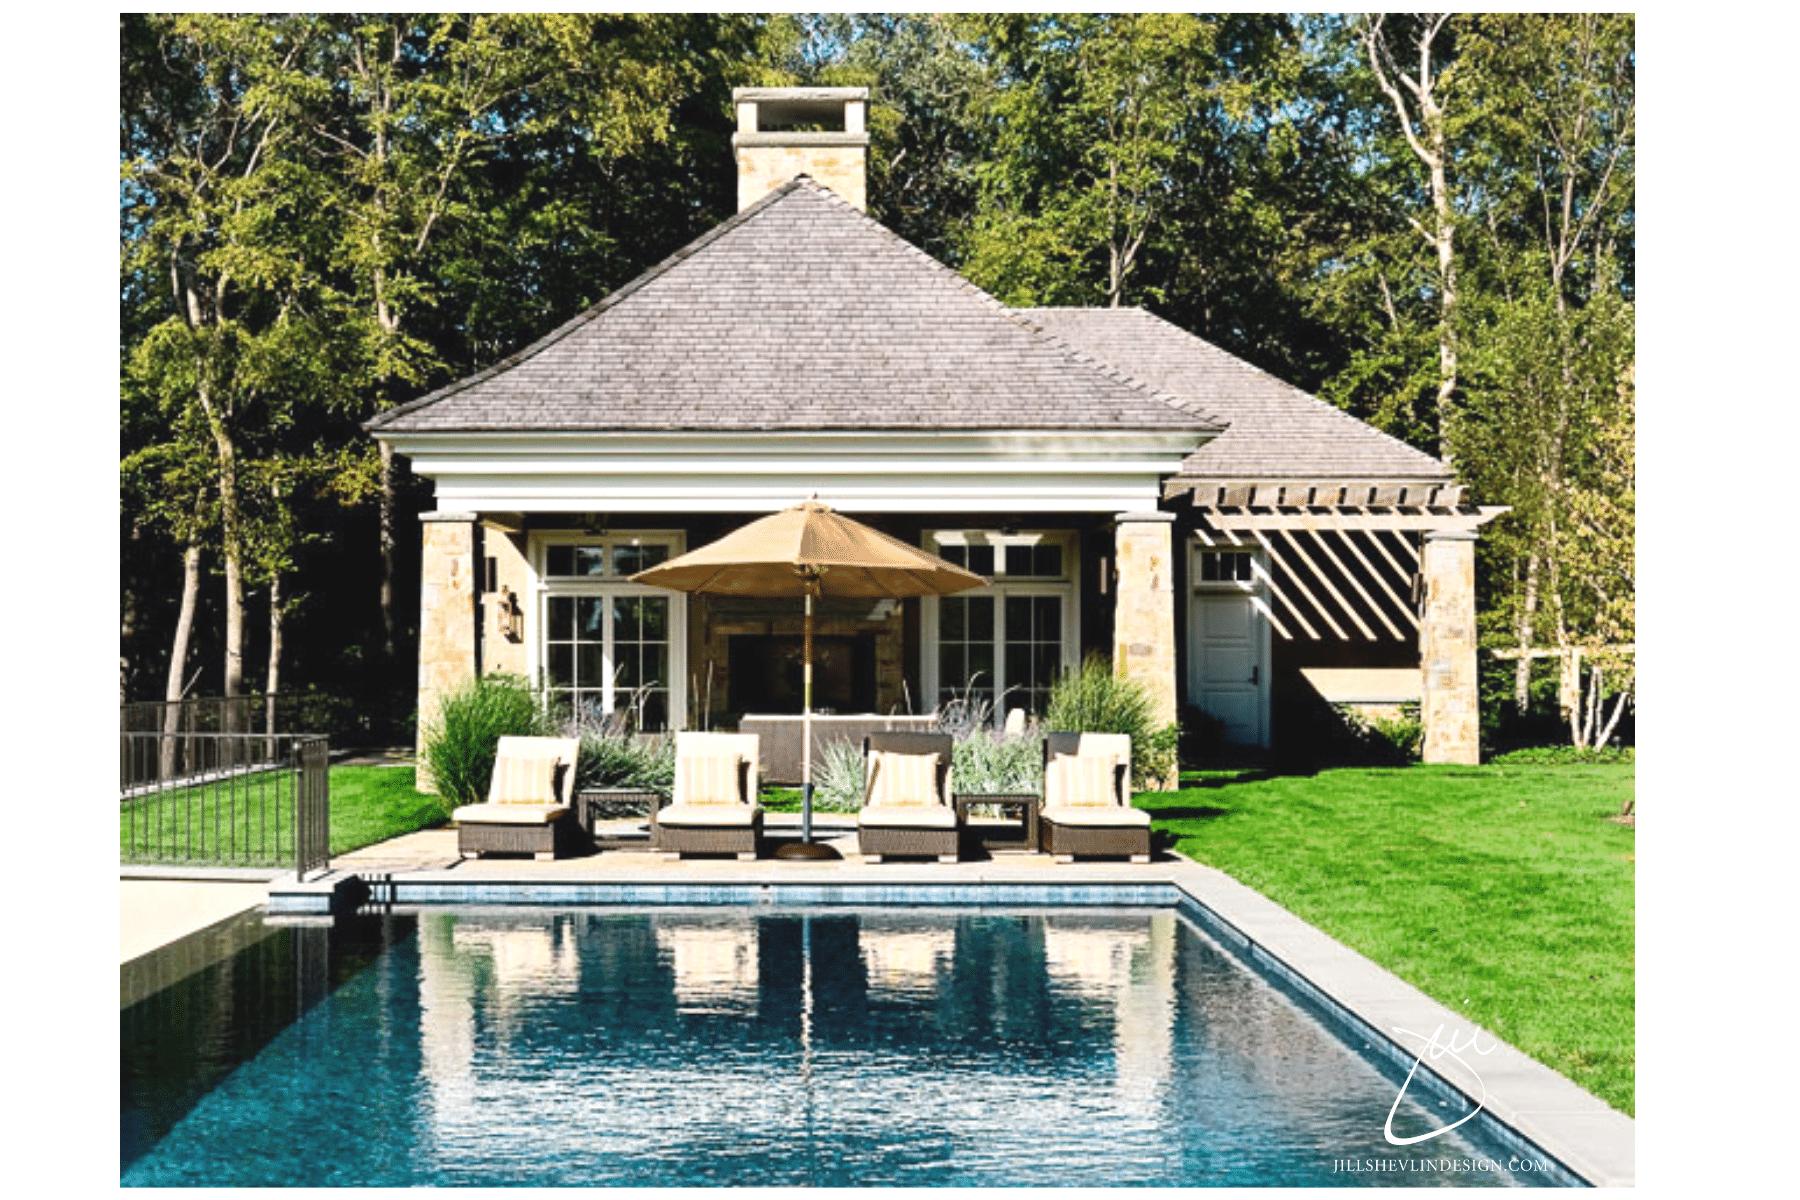 Jill Shevlin Design Vero Beach Interior Designer Outdoor Lounge Area of New York Home Vero Beach Interior Designer